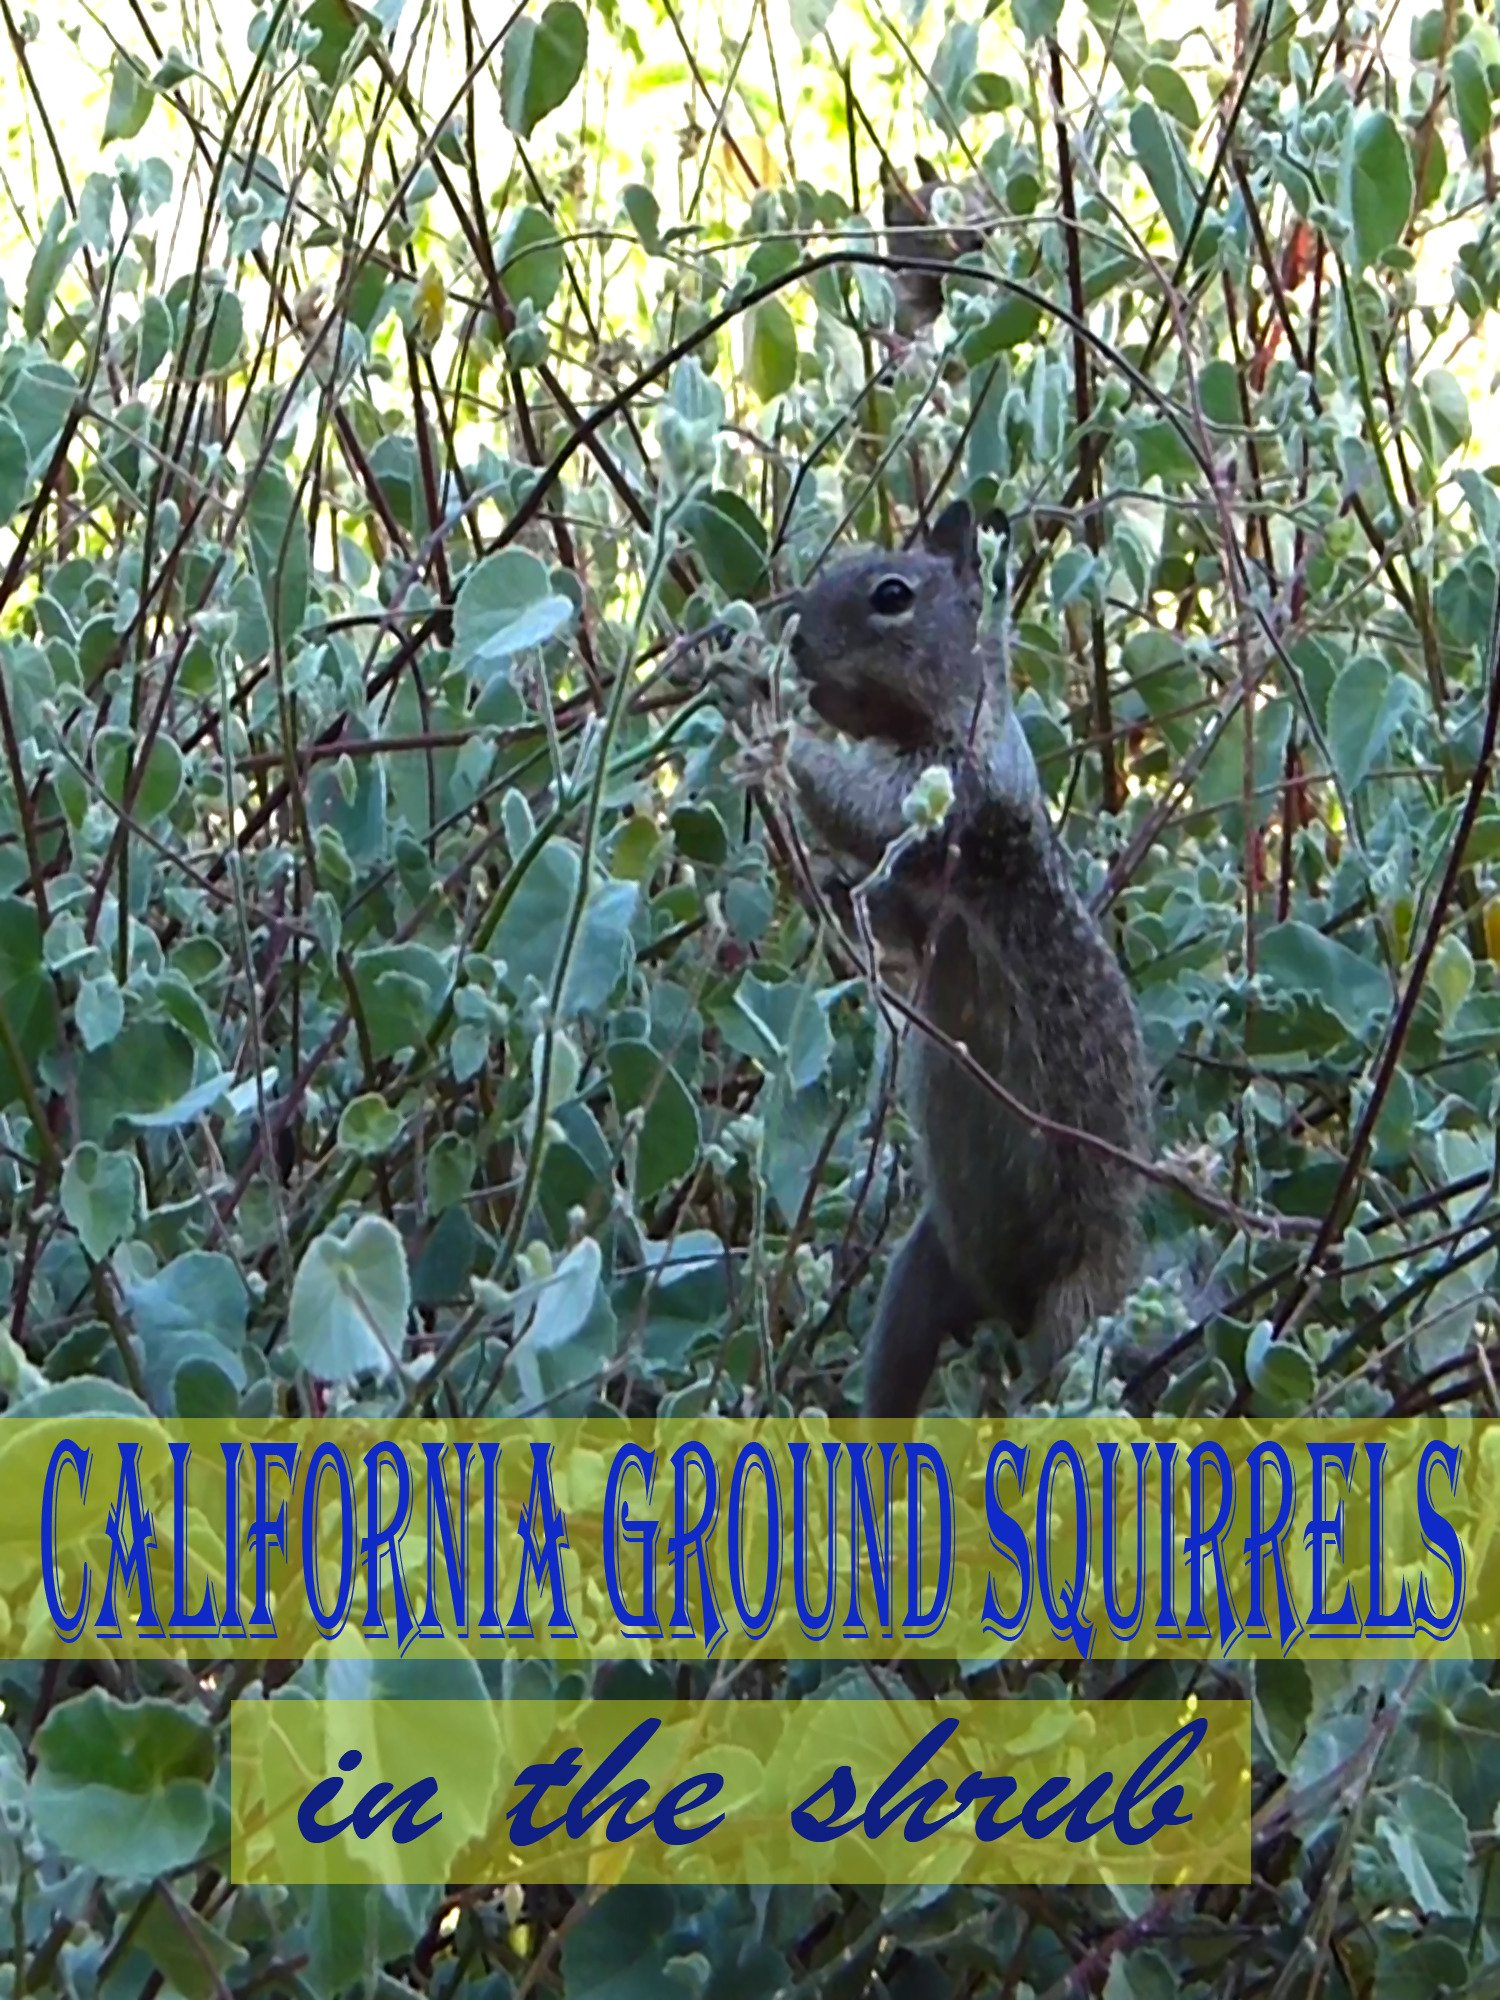 Clip: California Ground Squirrels in the shrub